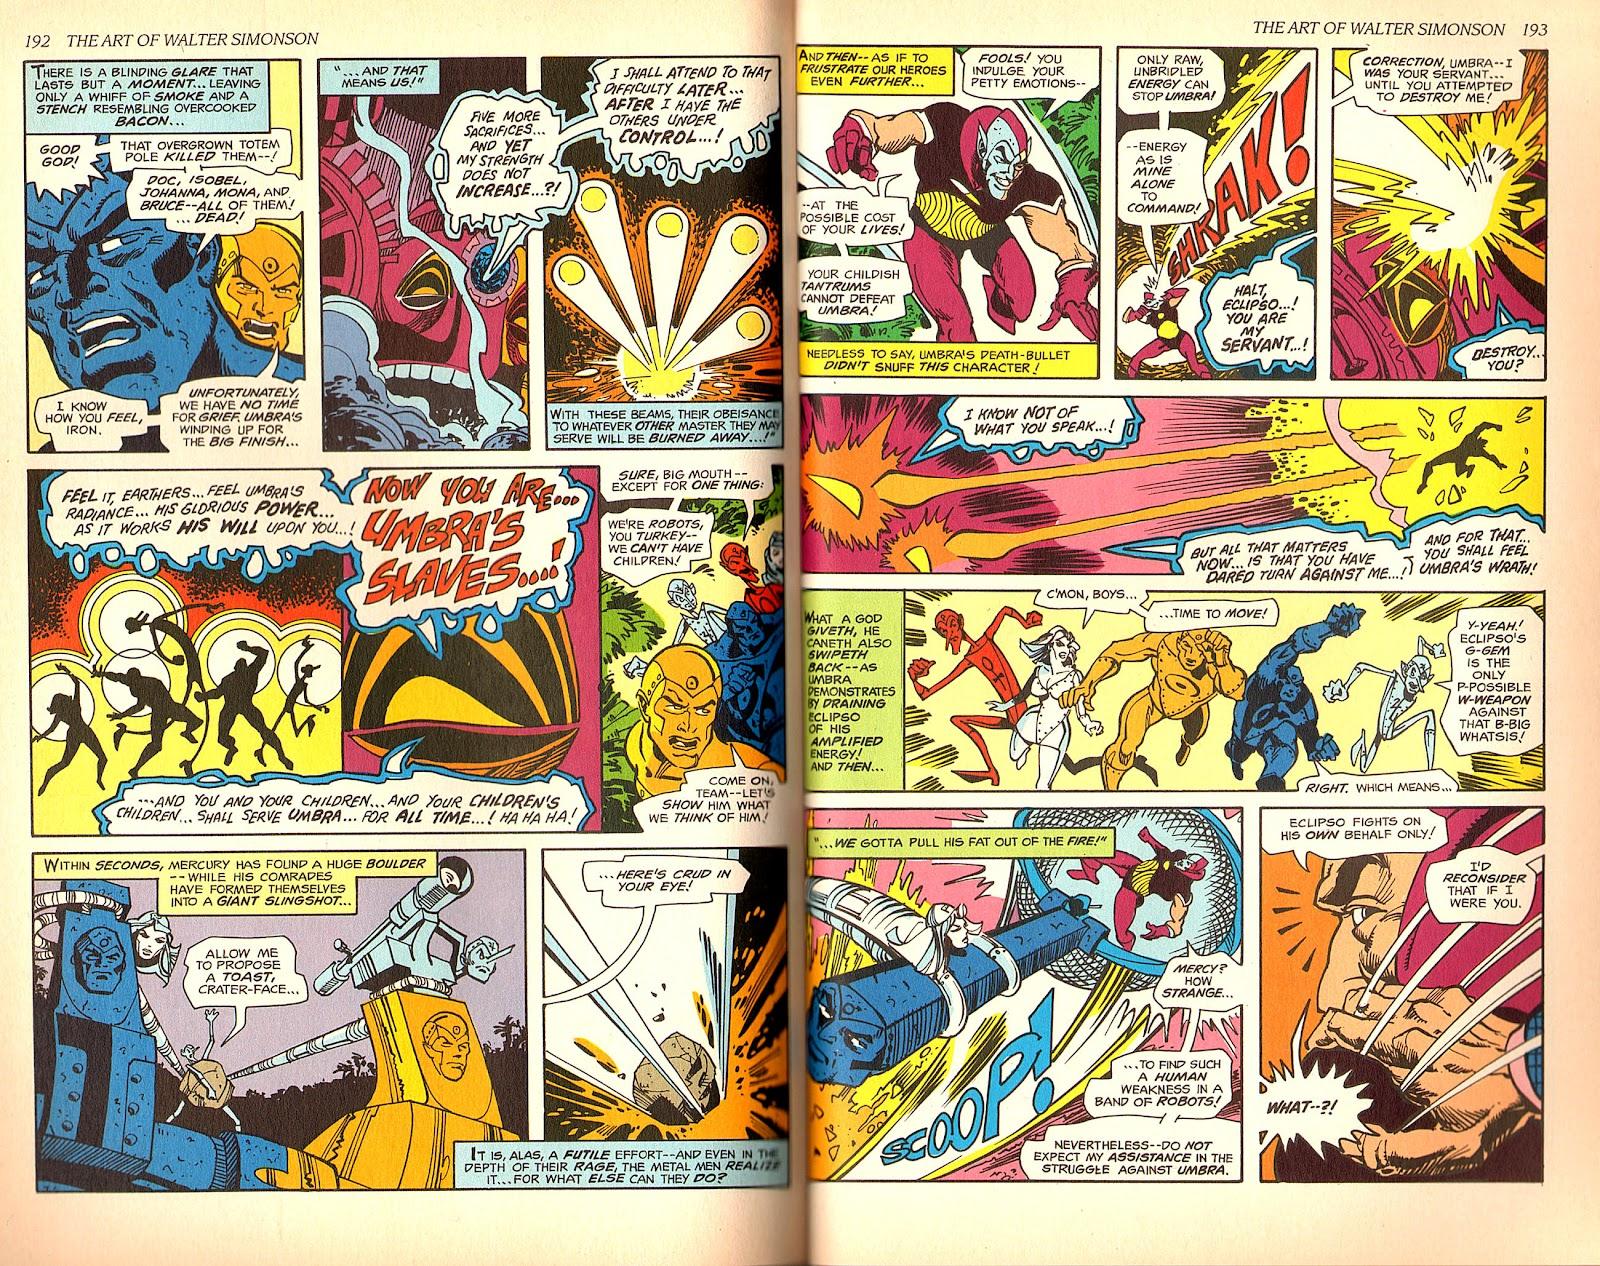 Read online The Art of Walter Simonson comic -  Issue # TPB - 98